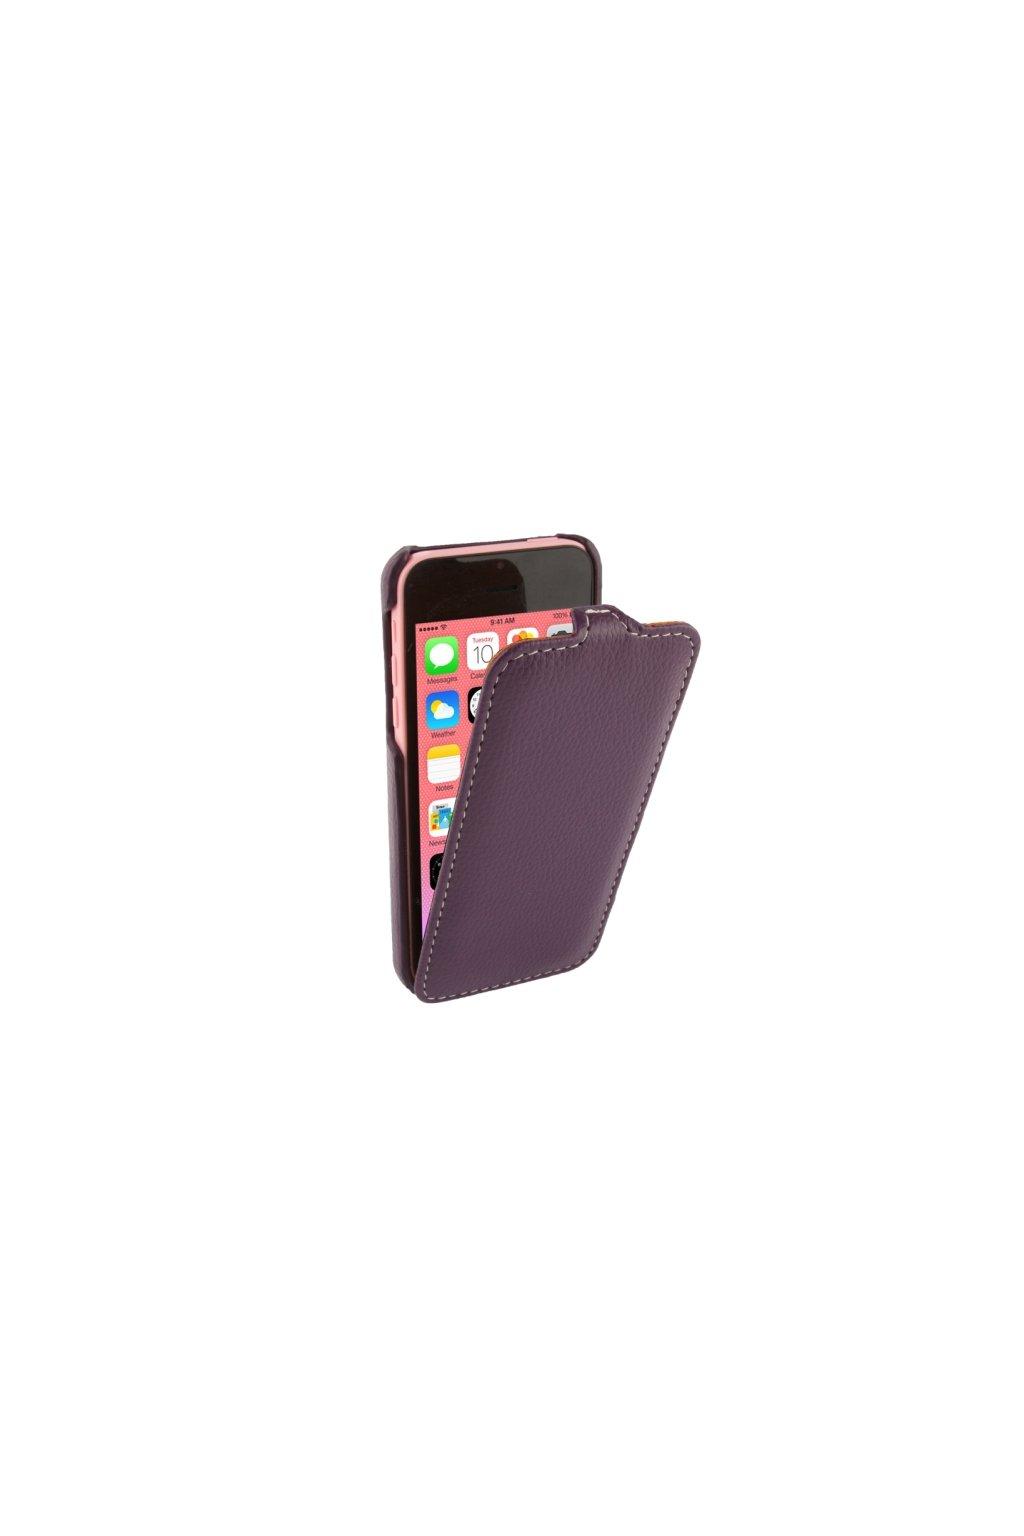 Pouzdro flip Melkco iPhone 5C, purple/fialová